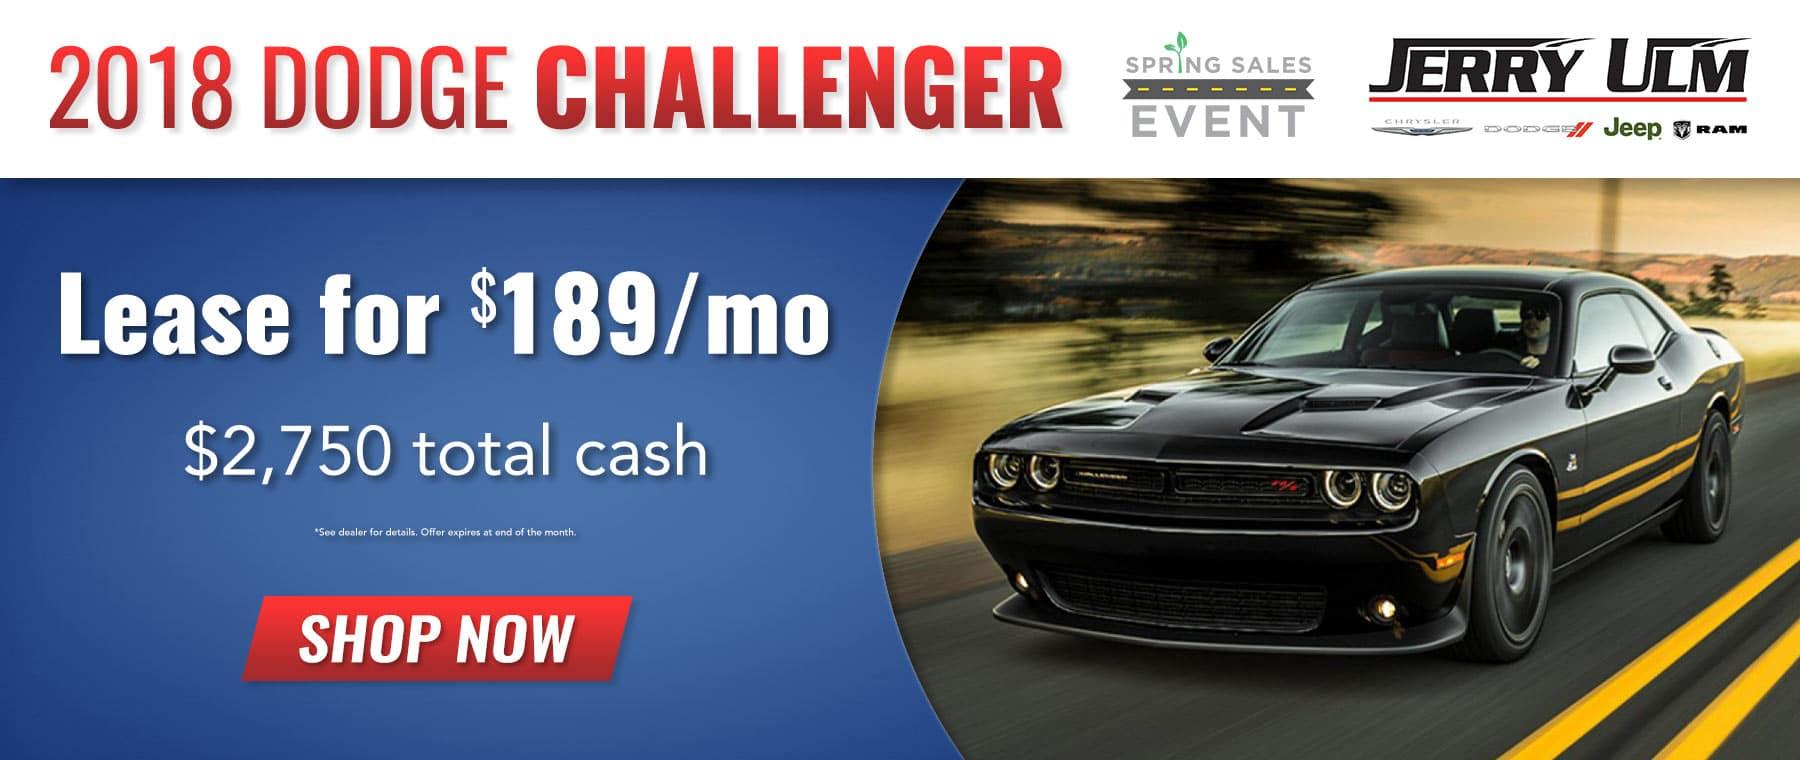 2018 Dodge Challenger special